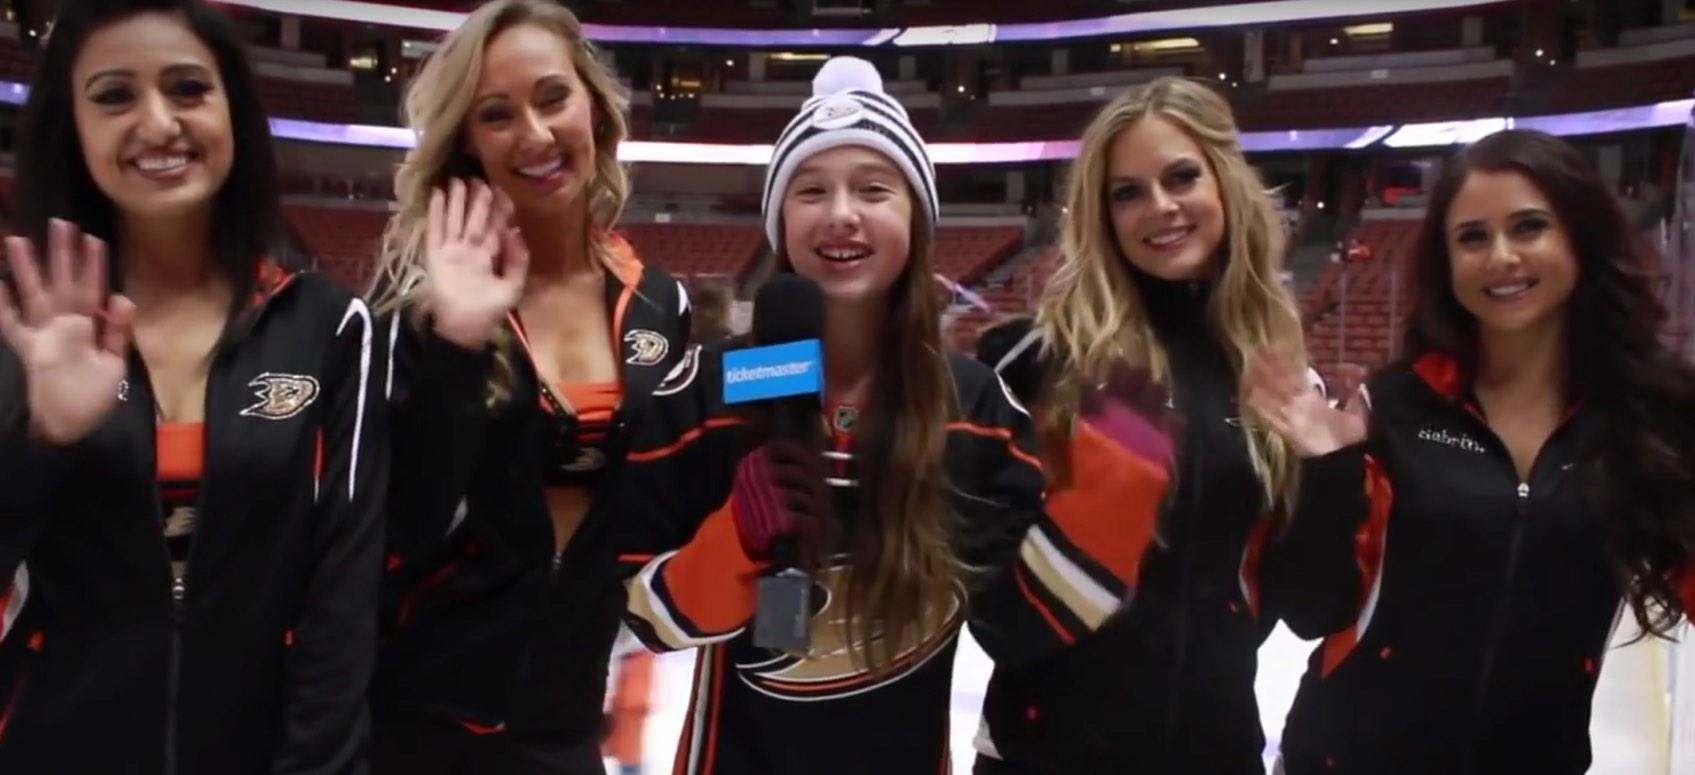 VIDEO: Minimaster Meets the Anaheim Ducks